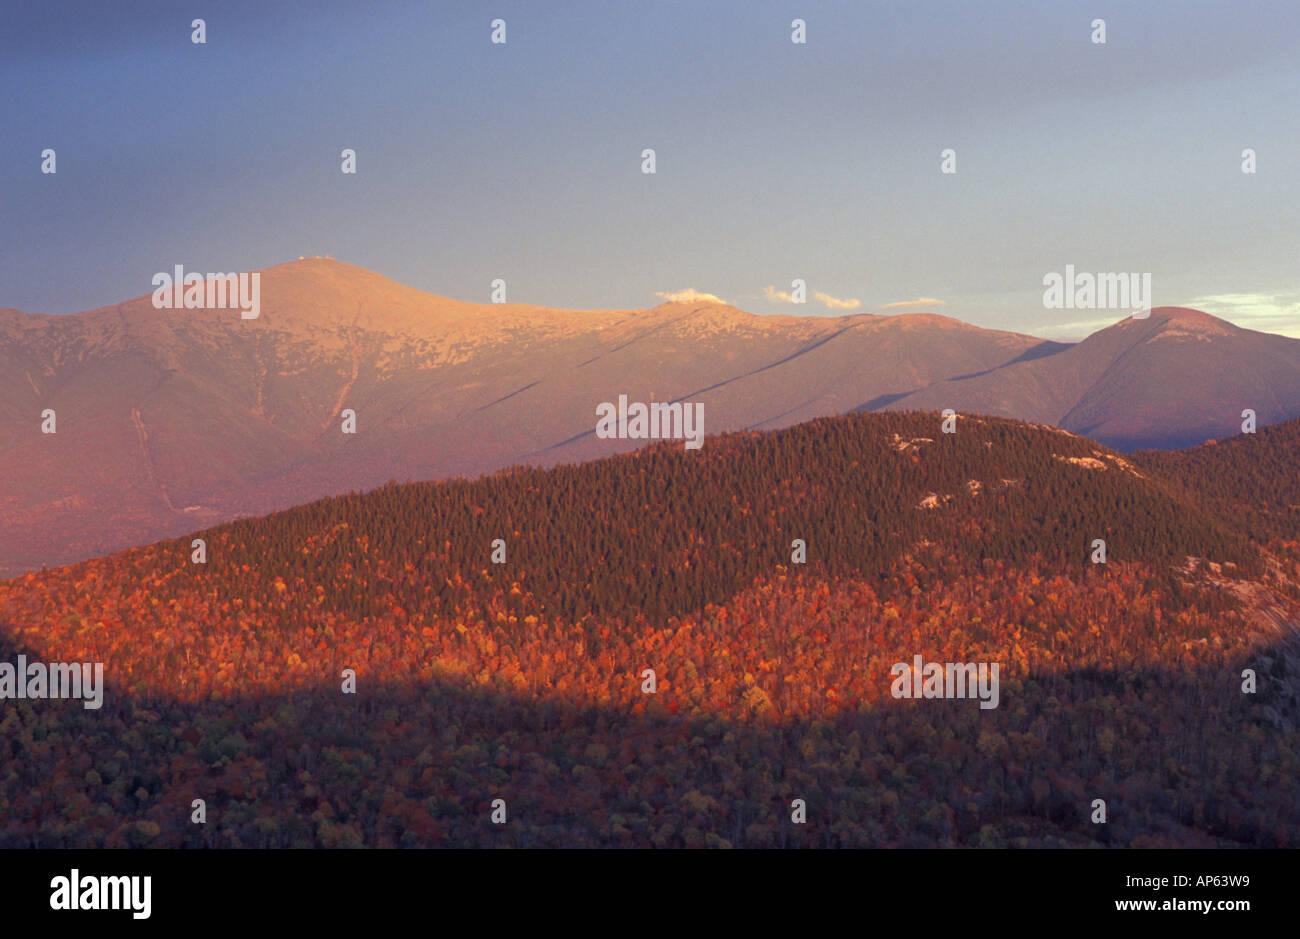 Twin Mountain Nh >> Twin Mountain Nh The View East To Mount Washington Mt